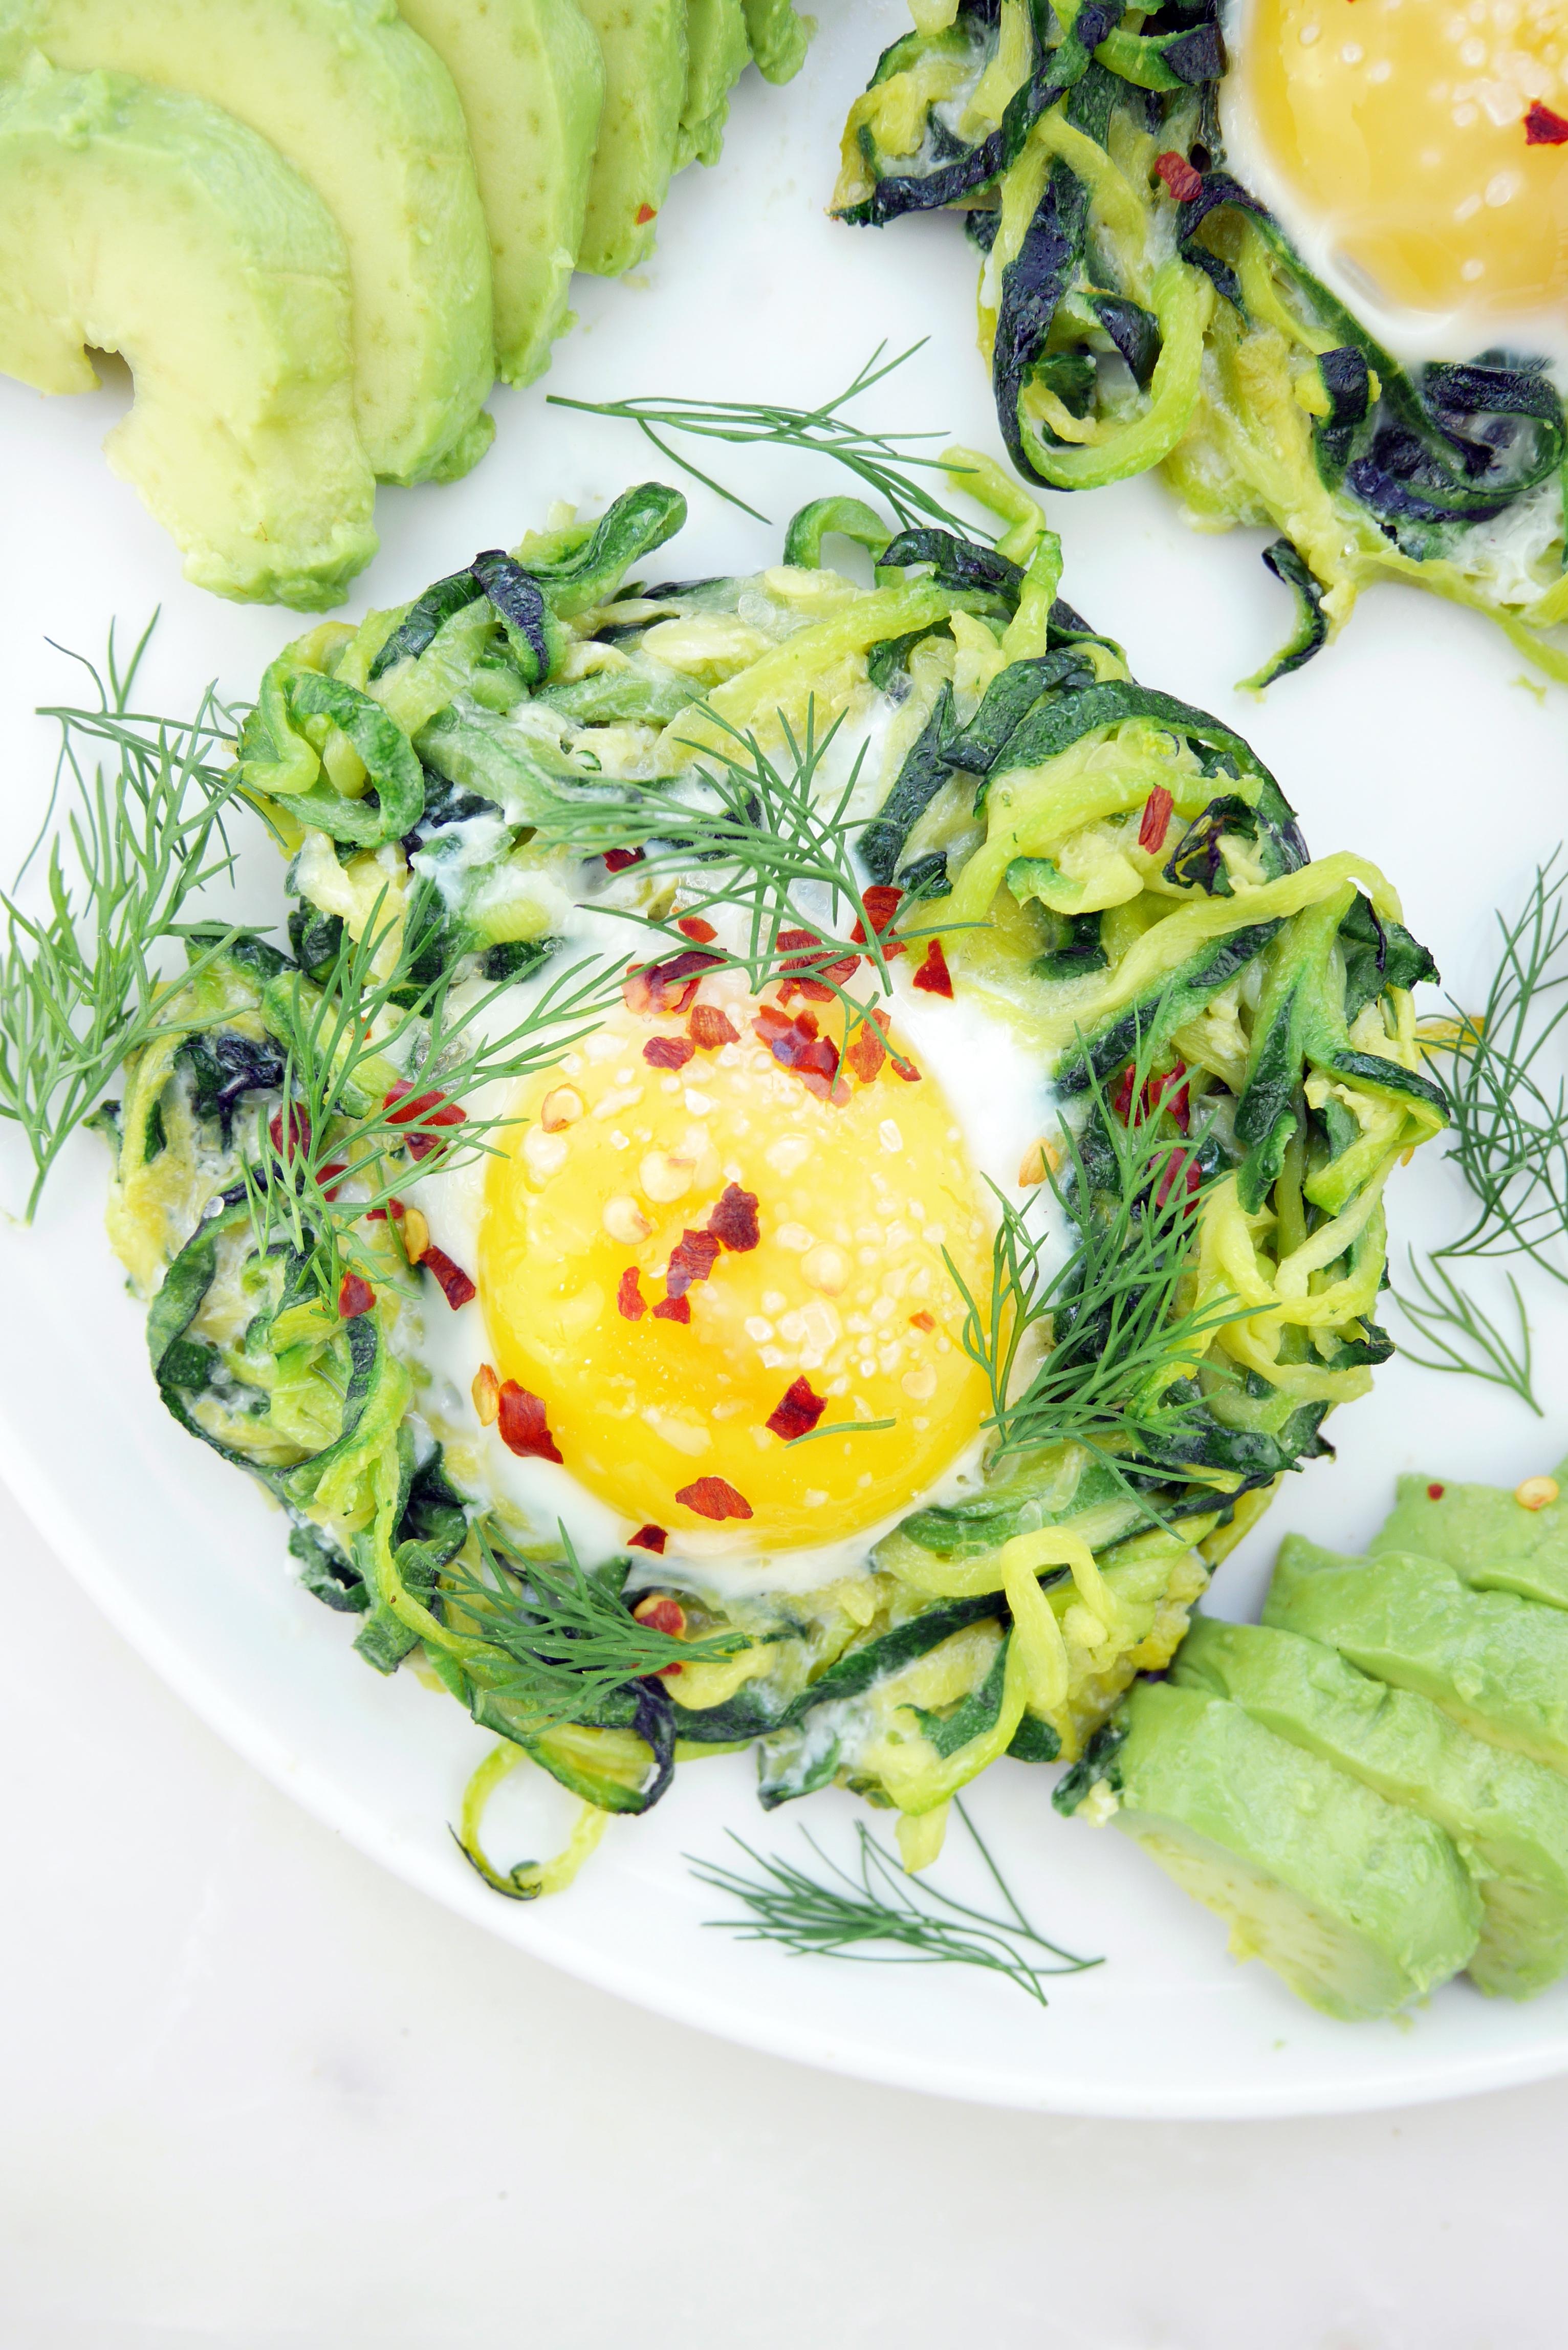 pasture-raised organic Handsome Brook Farm eggs